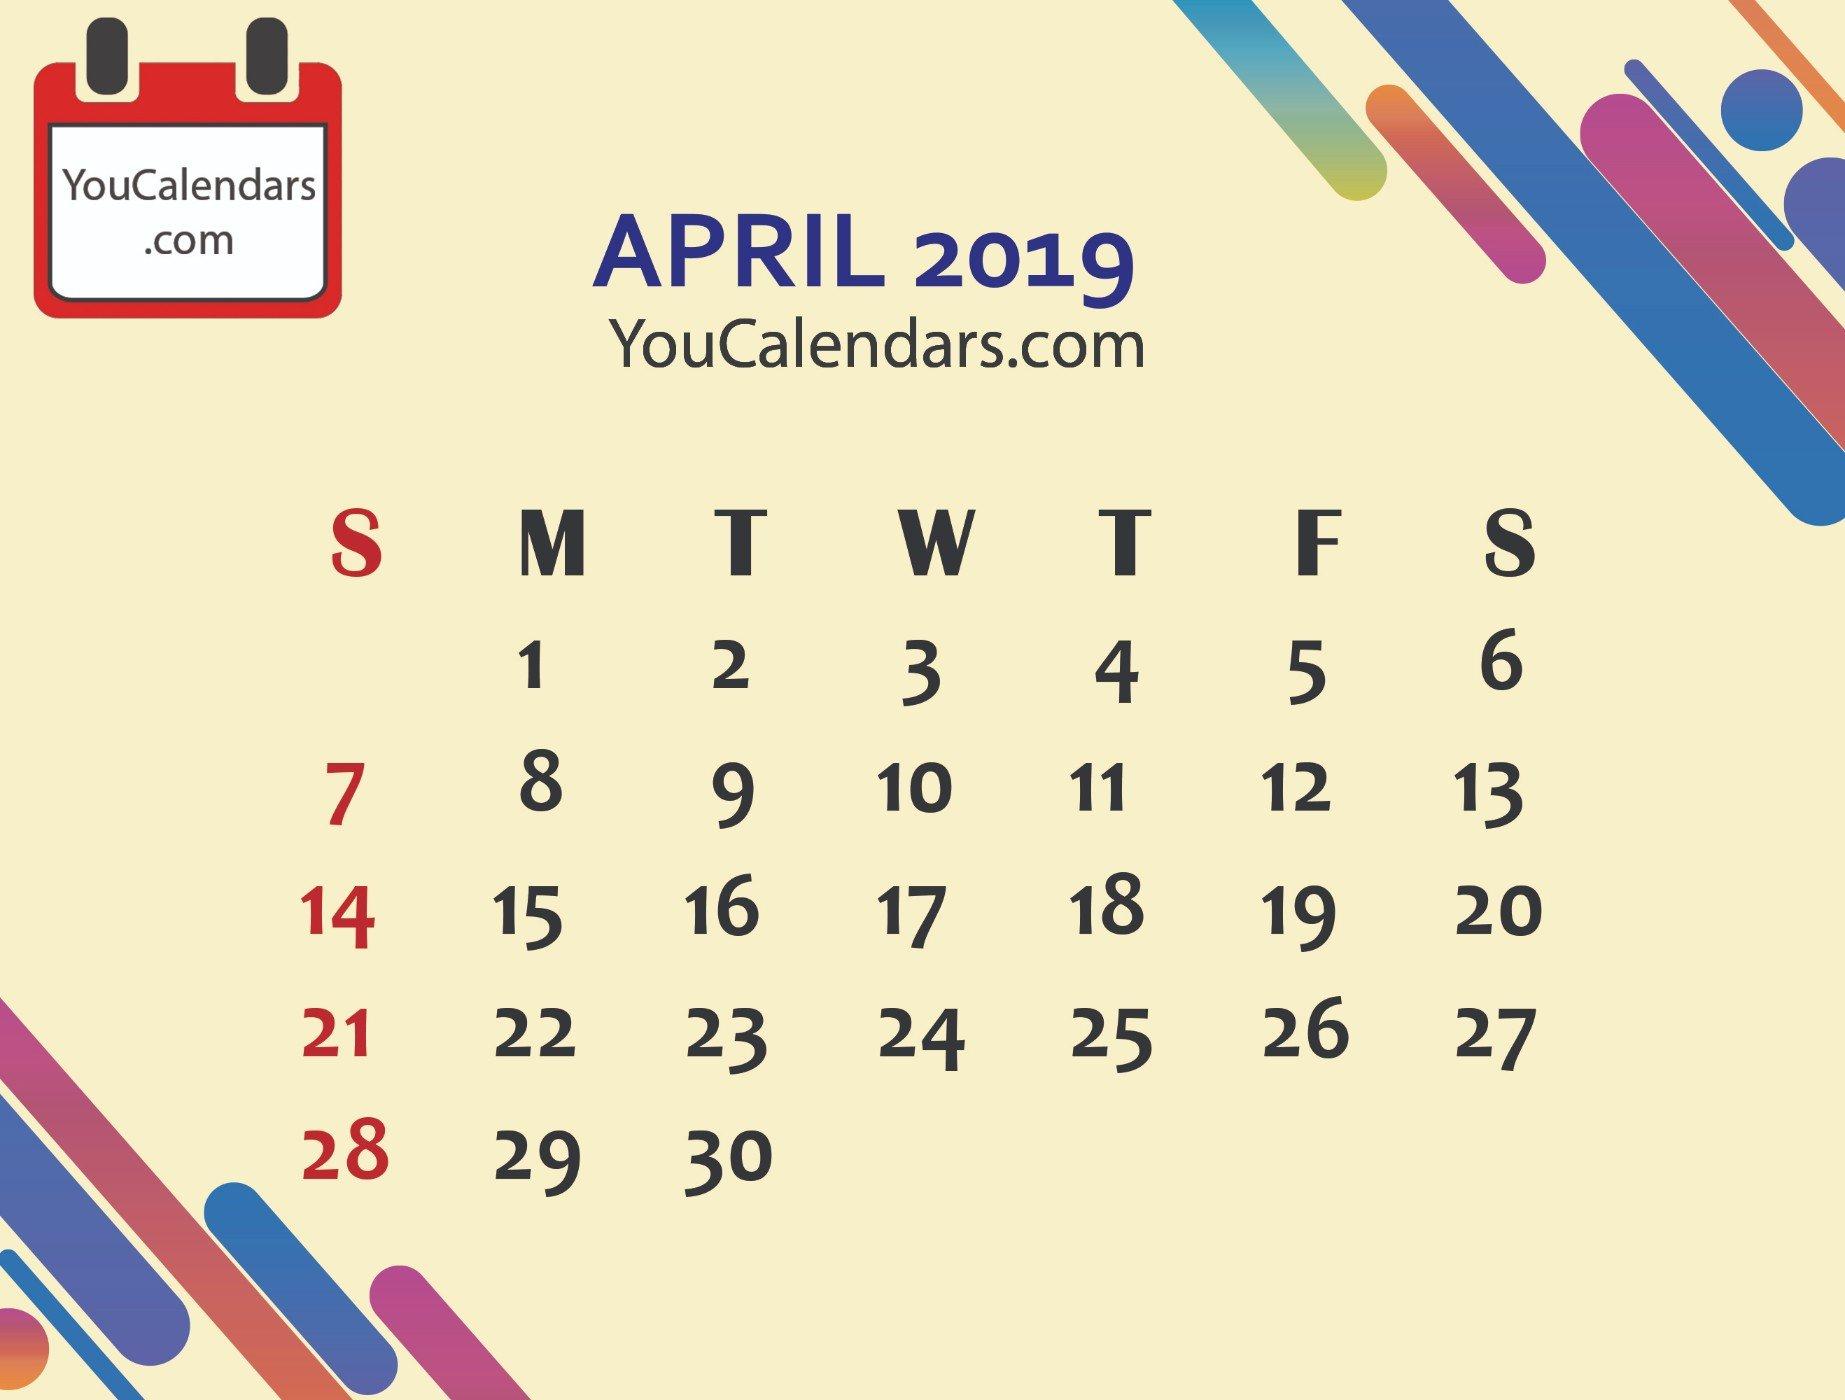 ✅Free April 2019 Calendar Printable Template - You Calendars April 5 2019 Calendar